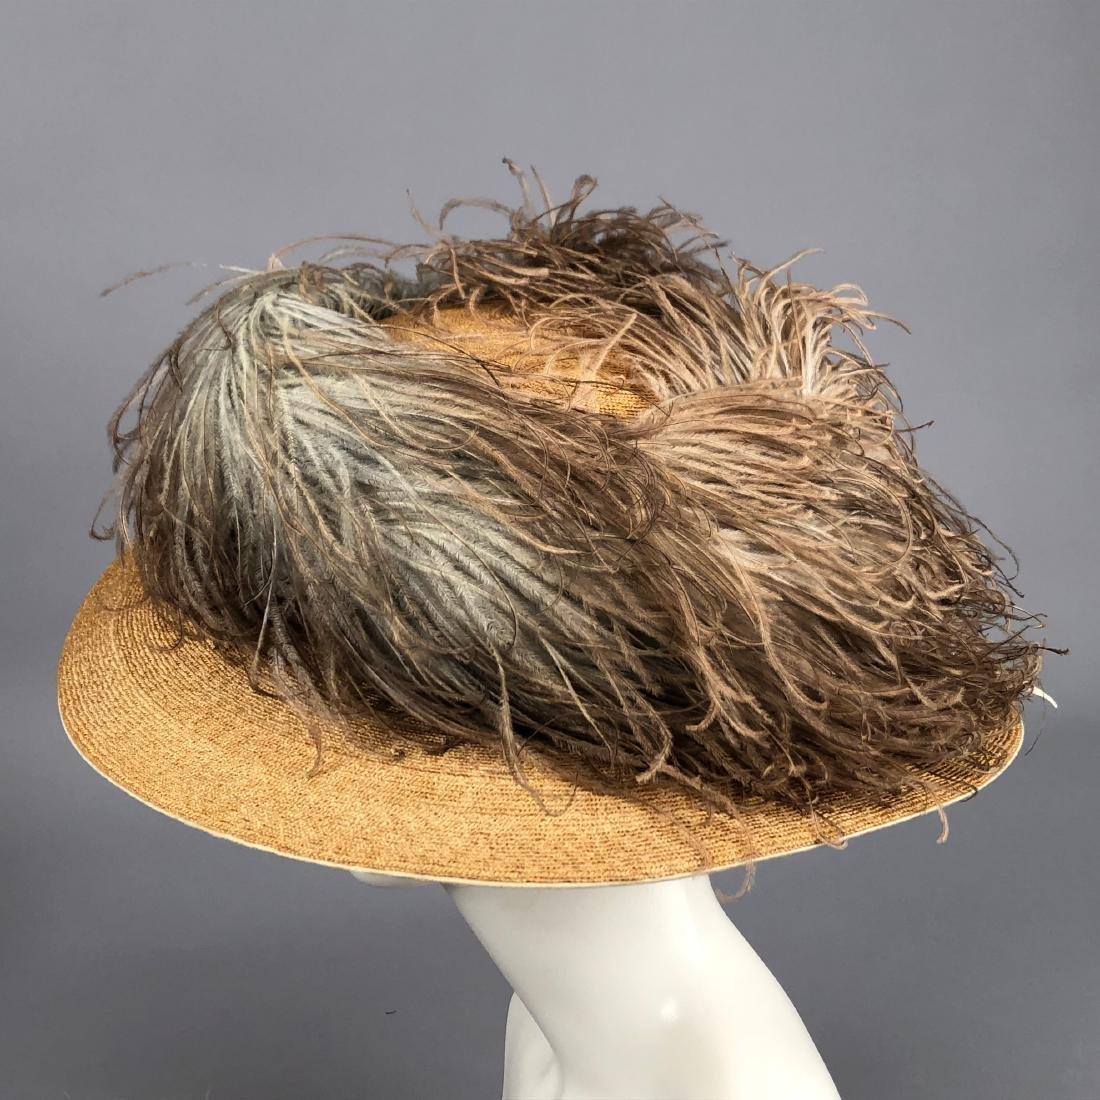 FOUR WIDE-BRIM STRAW HATS, 1905 - 1915 - 5